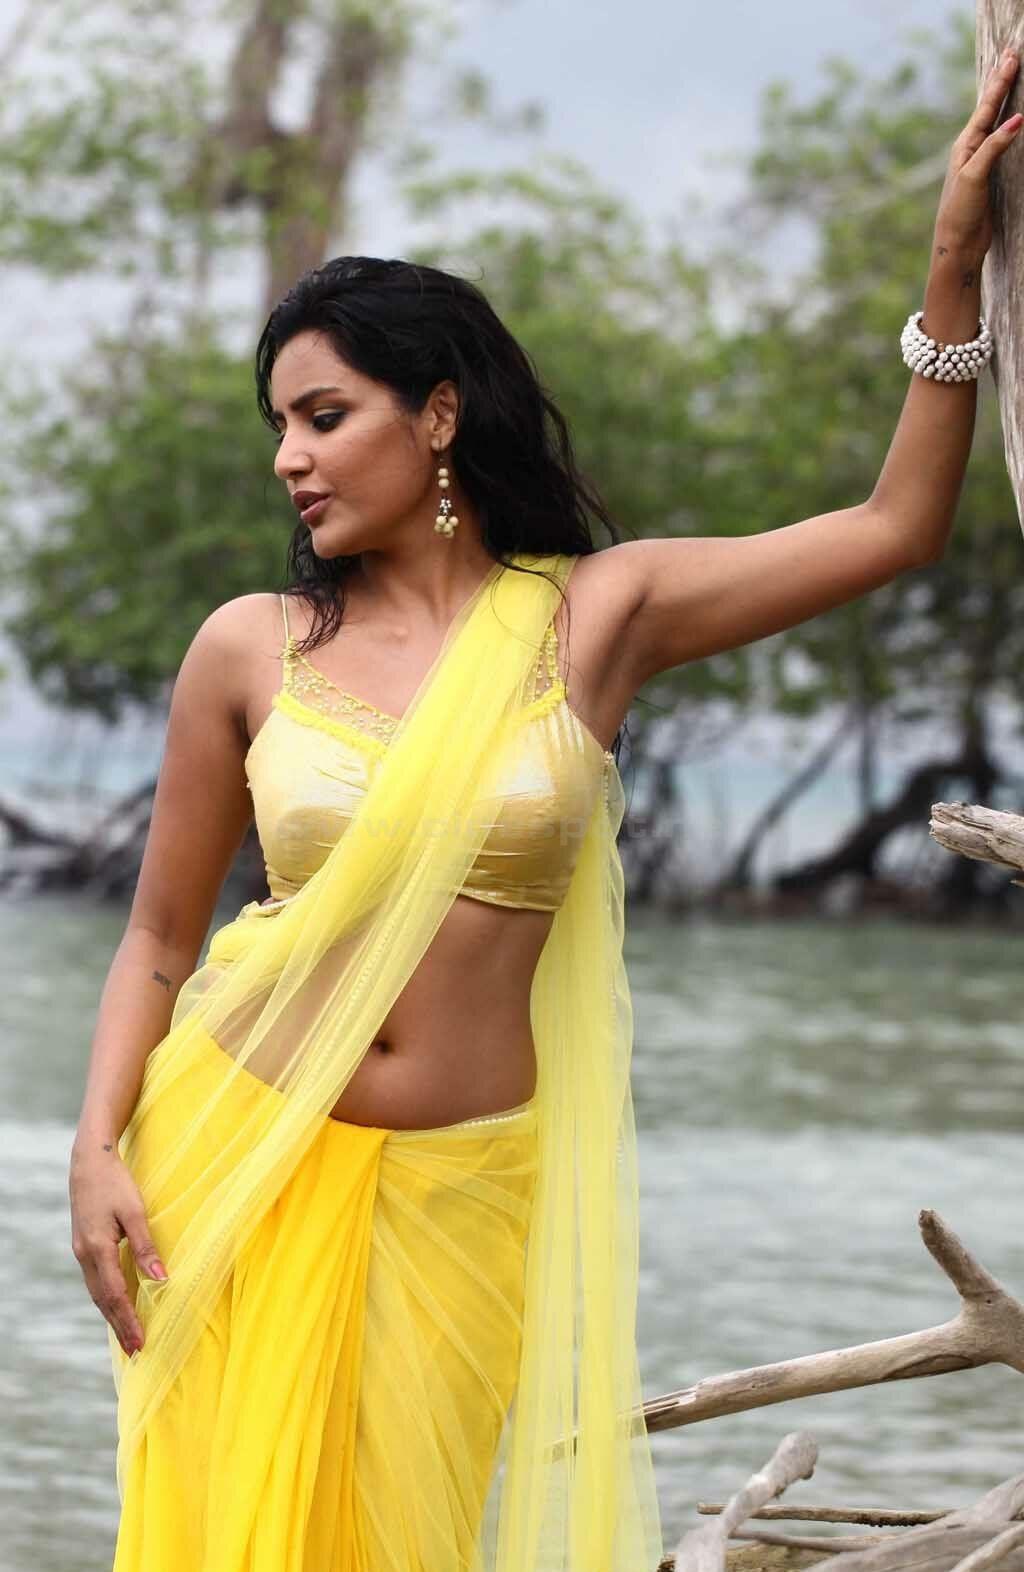 Priya Anand Hot Naval Exposing Photo Images